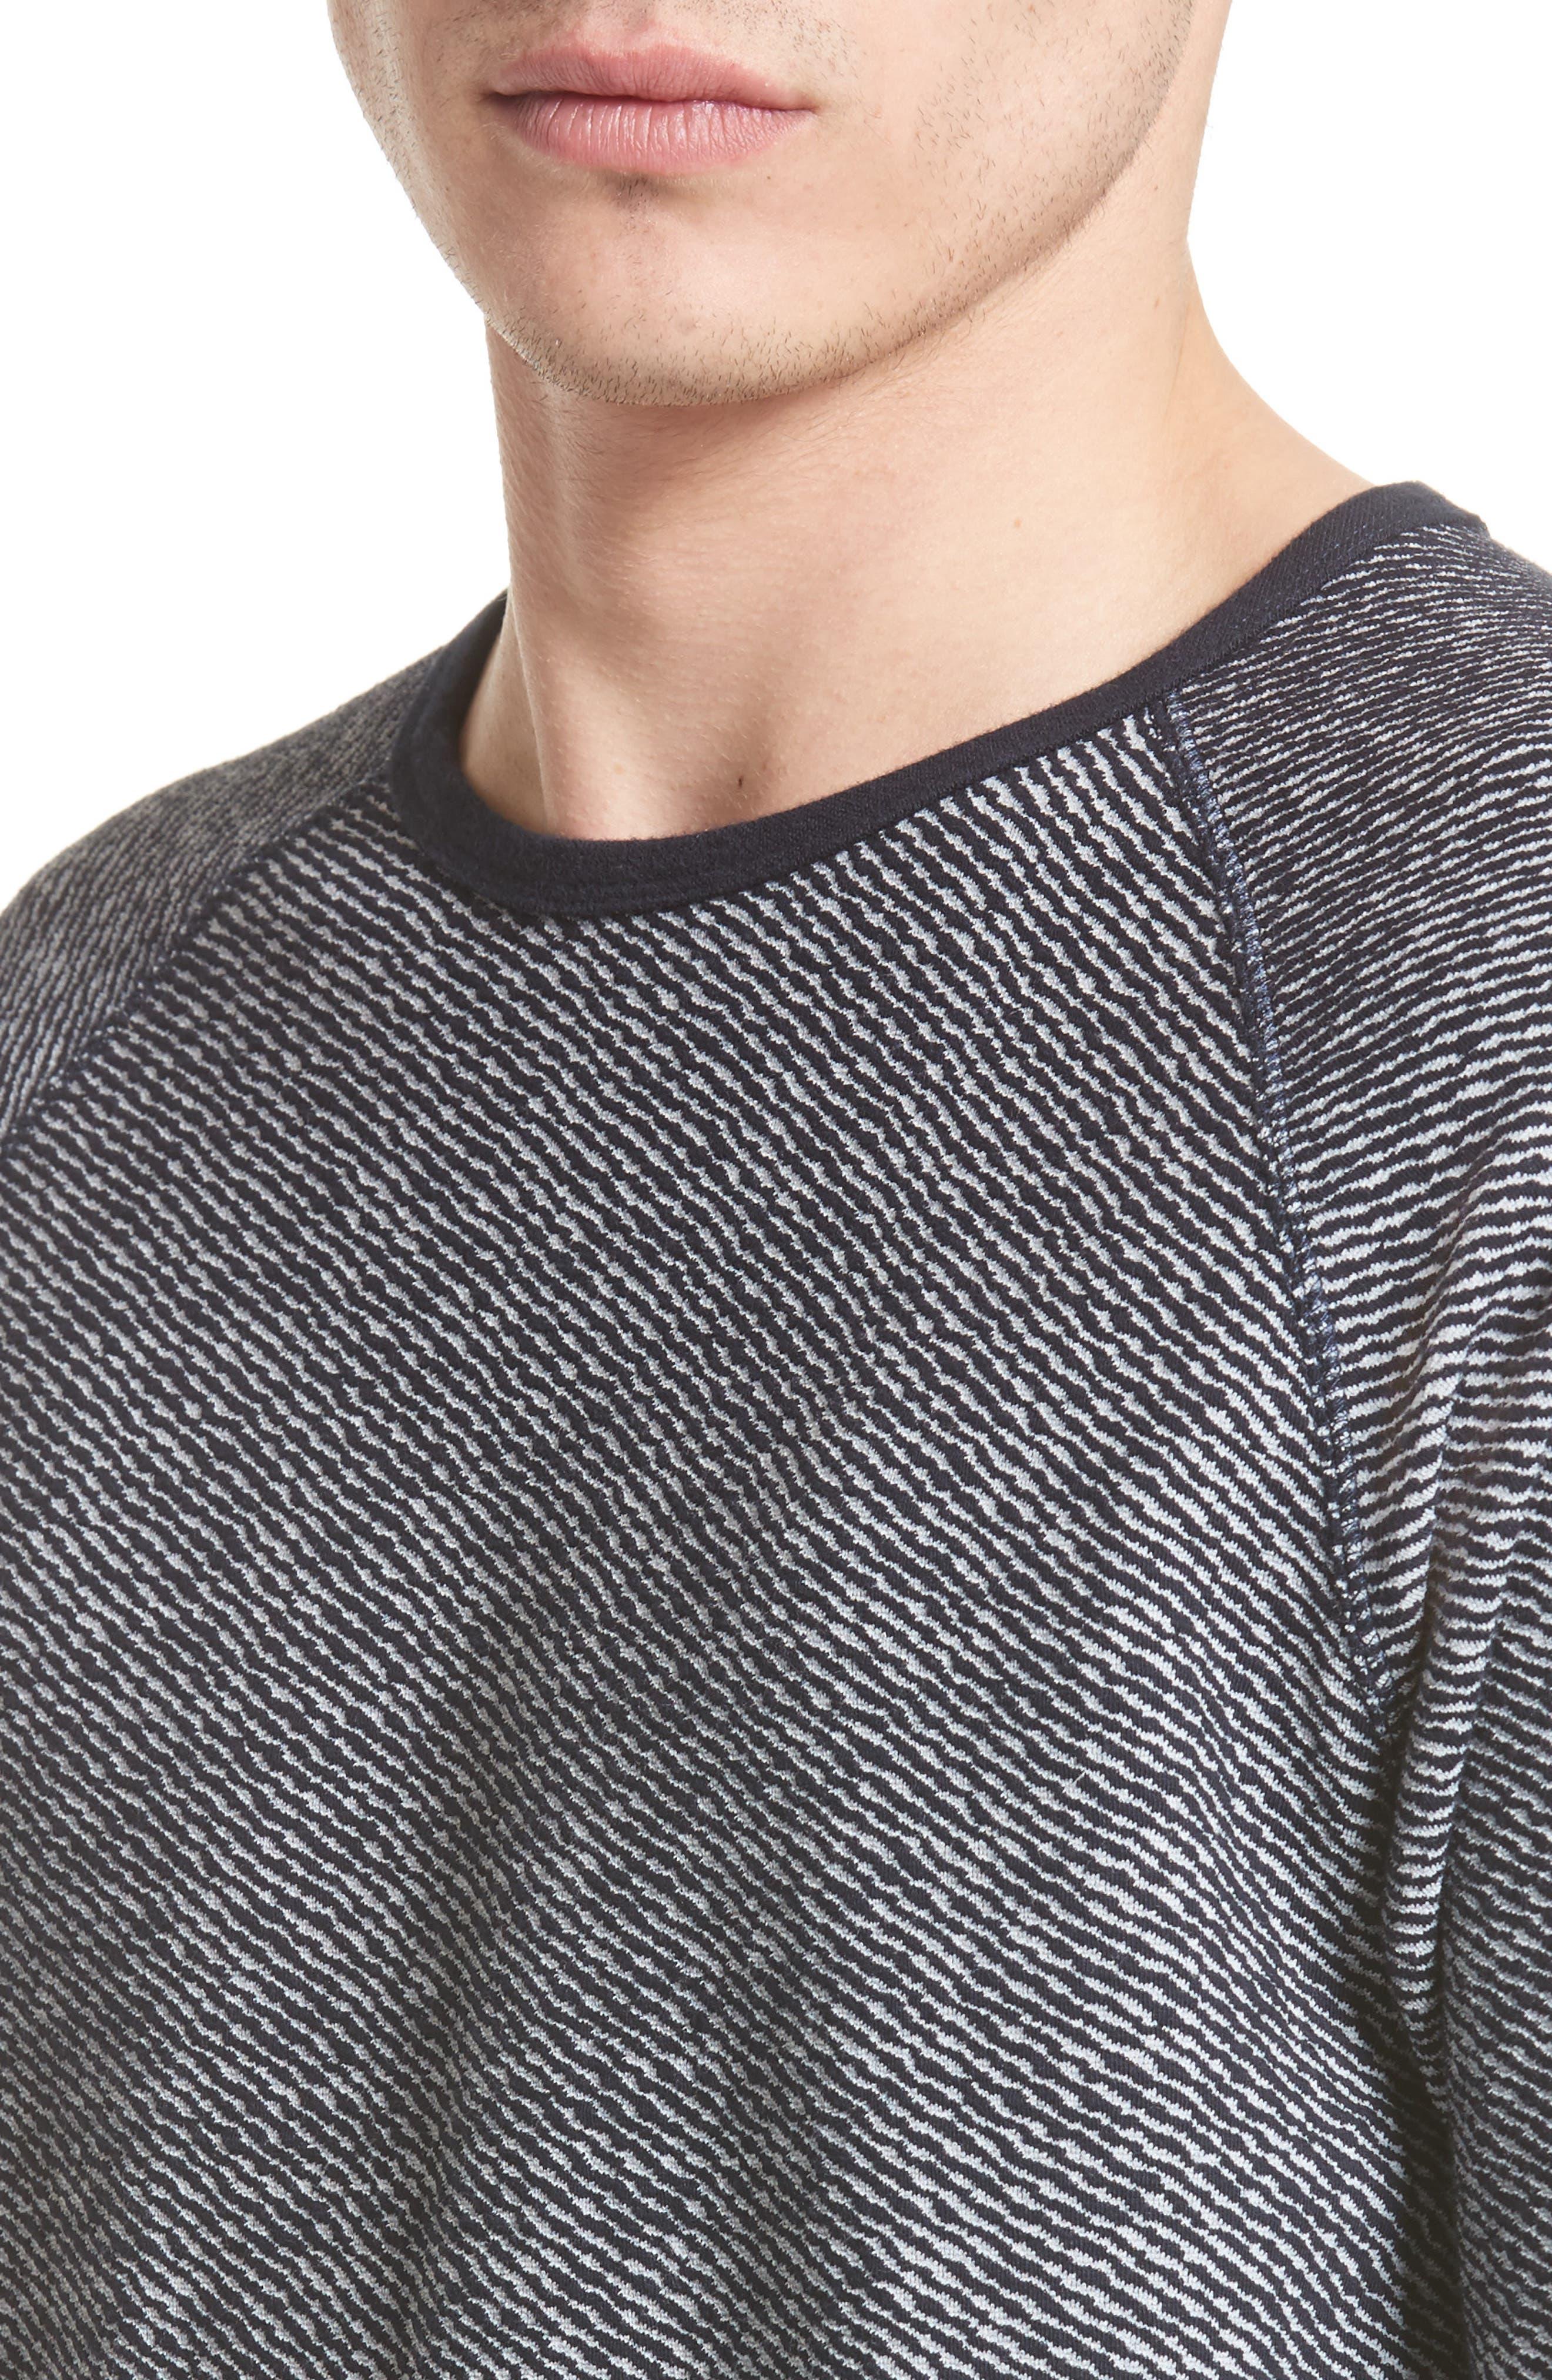 Kasu Sweater,                             Alternate thumbnail 8, color,